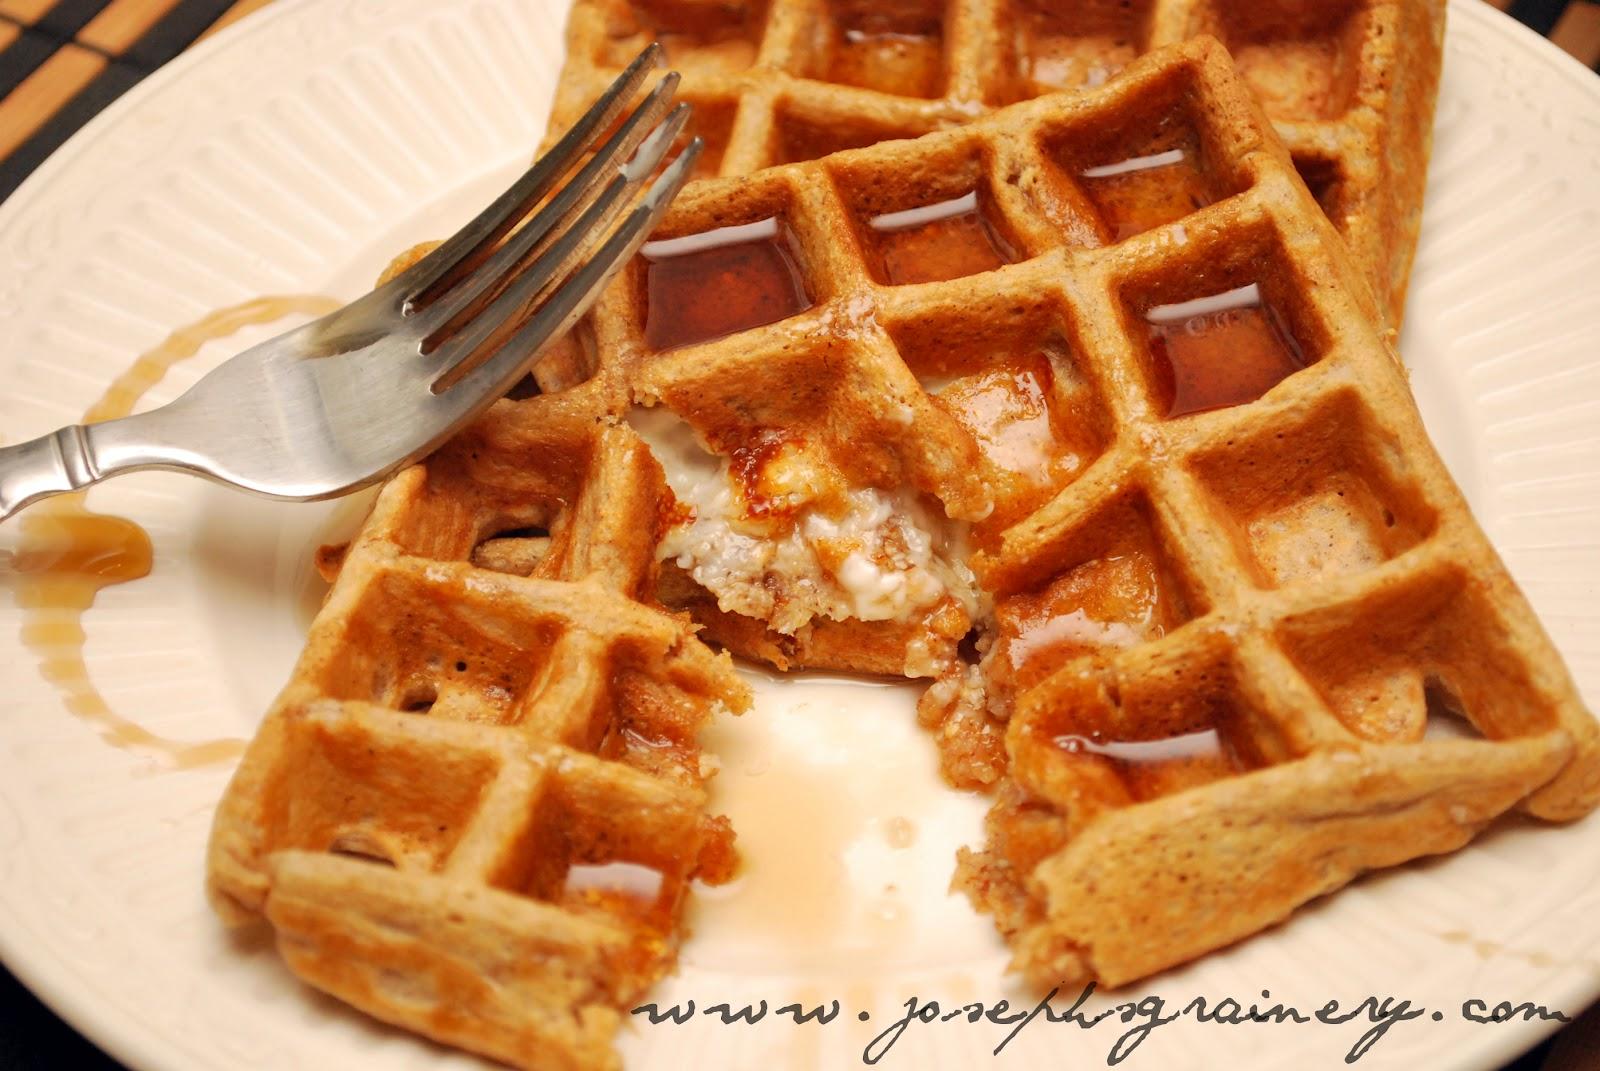 Joseph's Grainery: Cream Cheese Stuffed Whole Grain Waffles